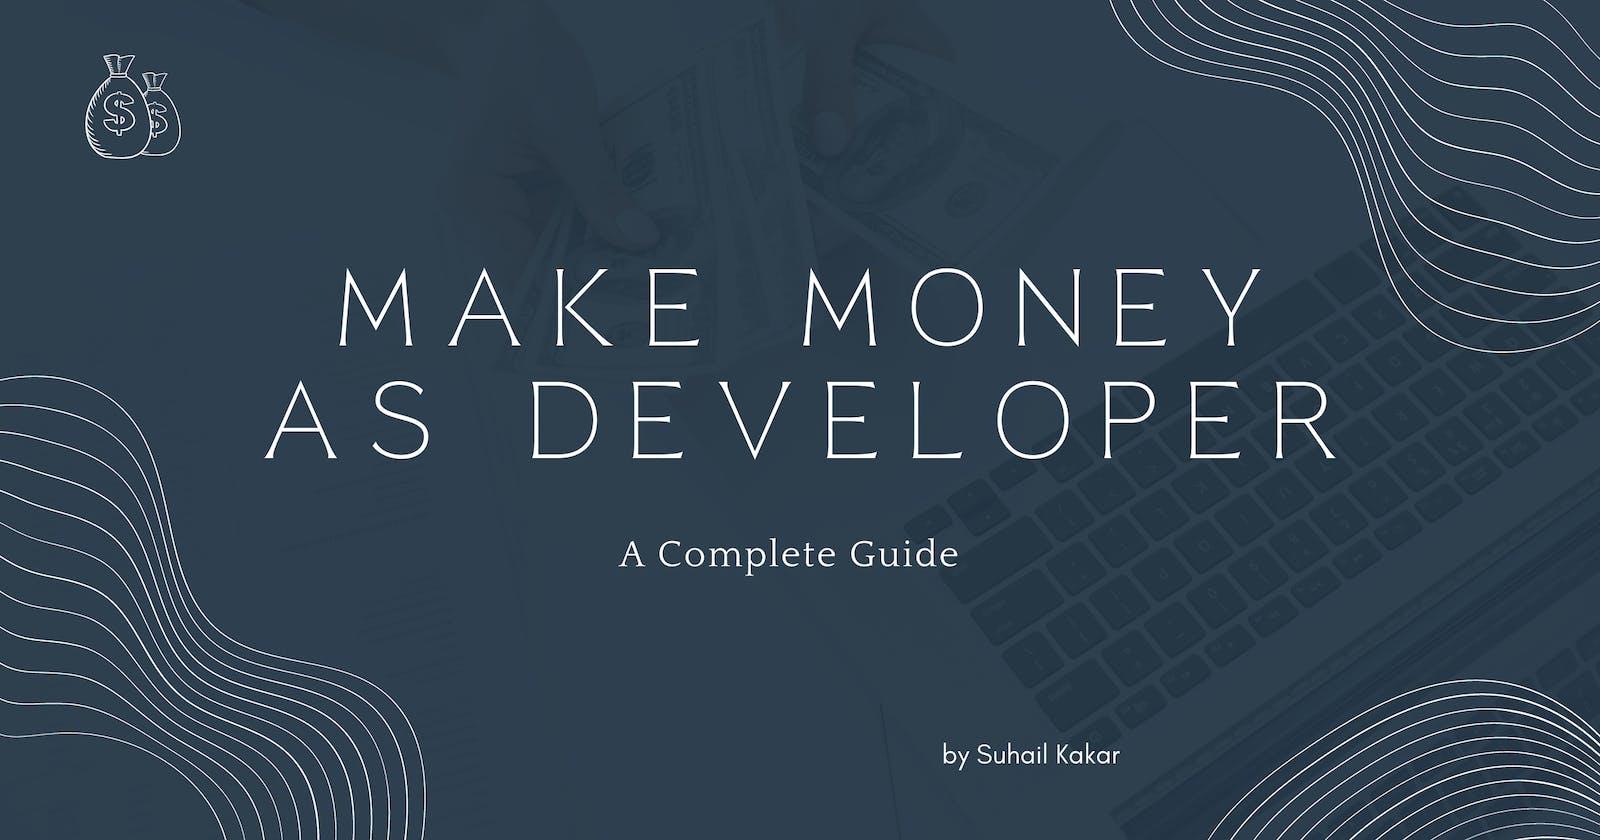 5 Easy Ways To Make Money As A Developer